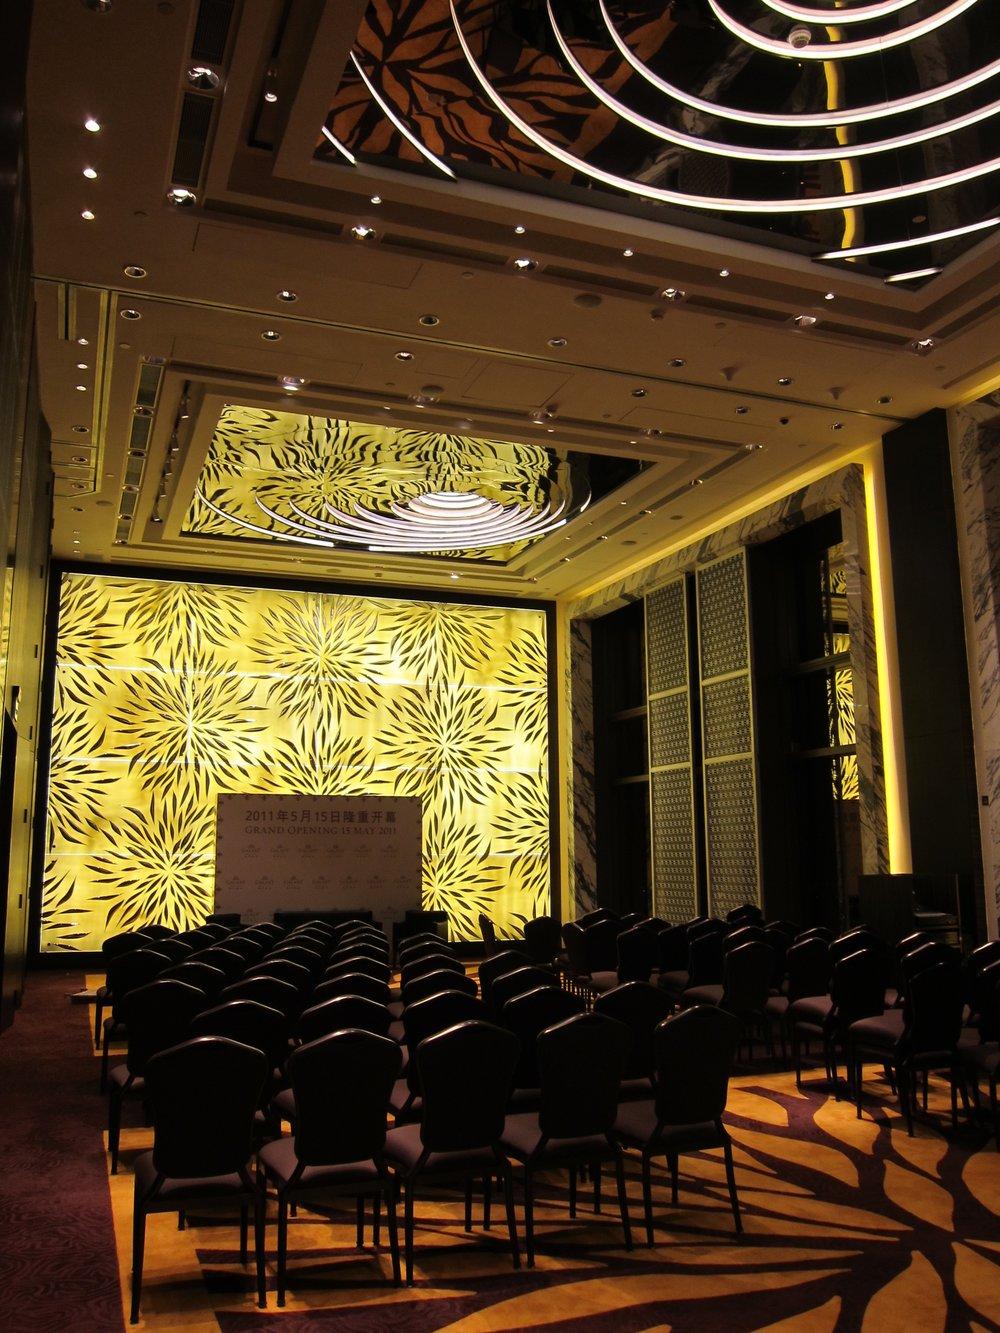 MEETING ROOM @ HOTEL OKURA, MACAU